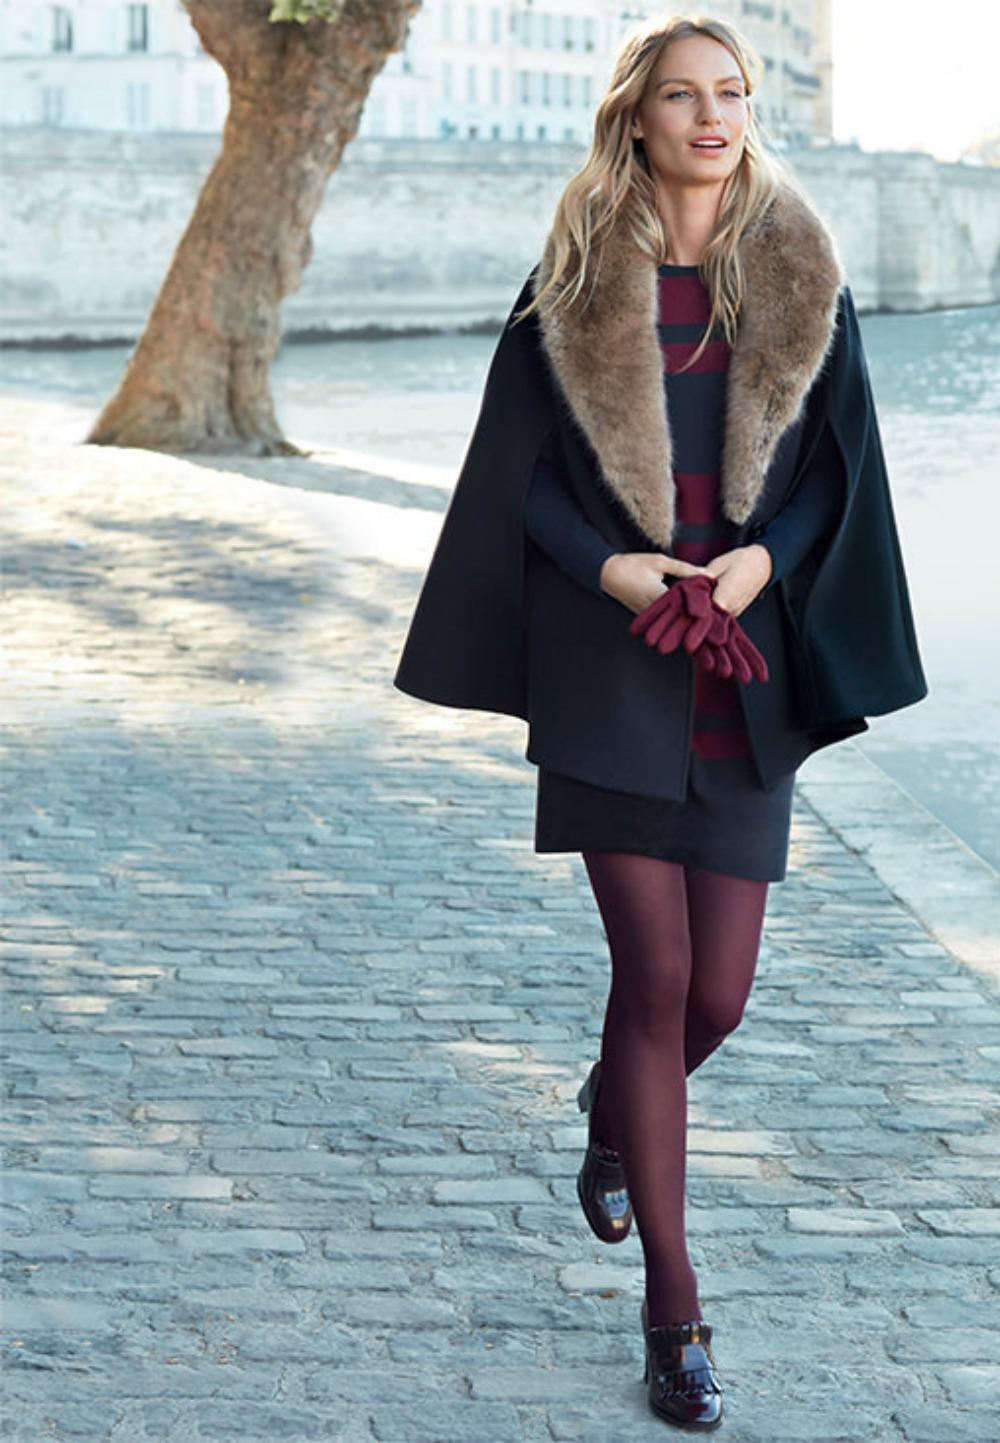 Caroll - Madame Figaro 91953a5e198